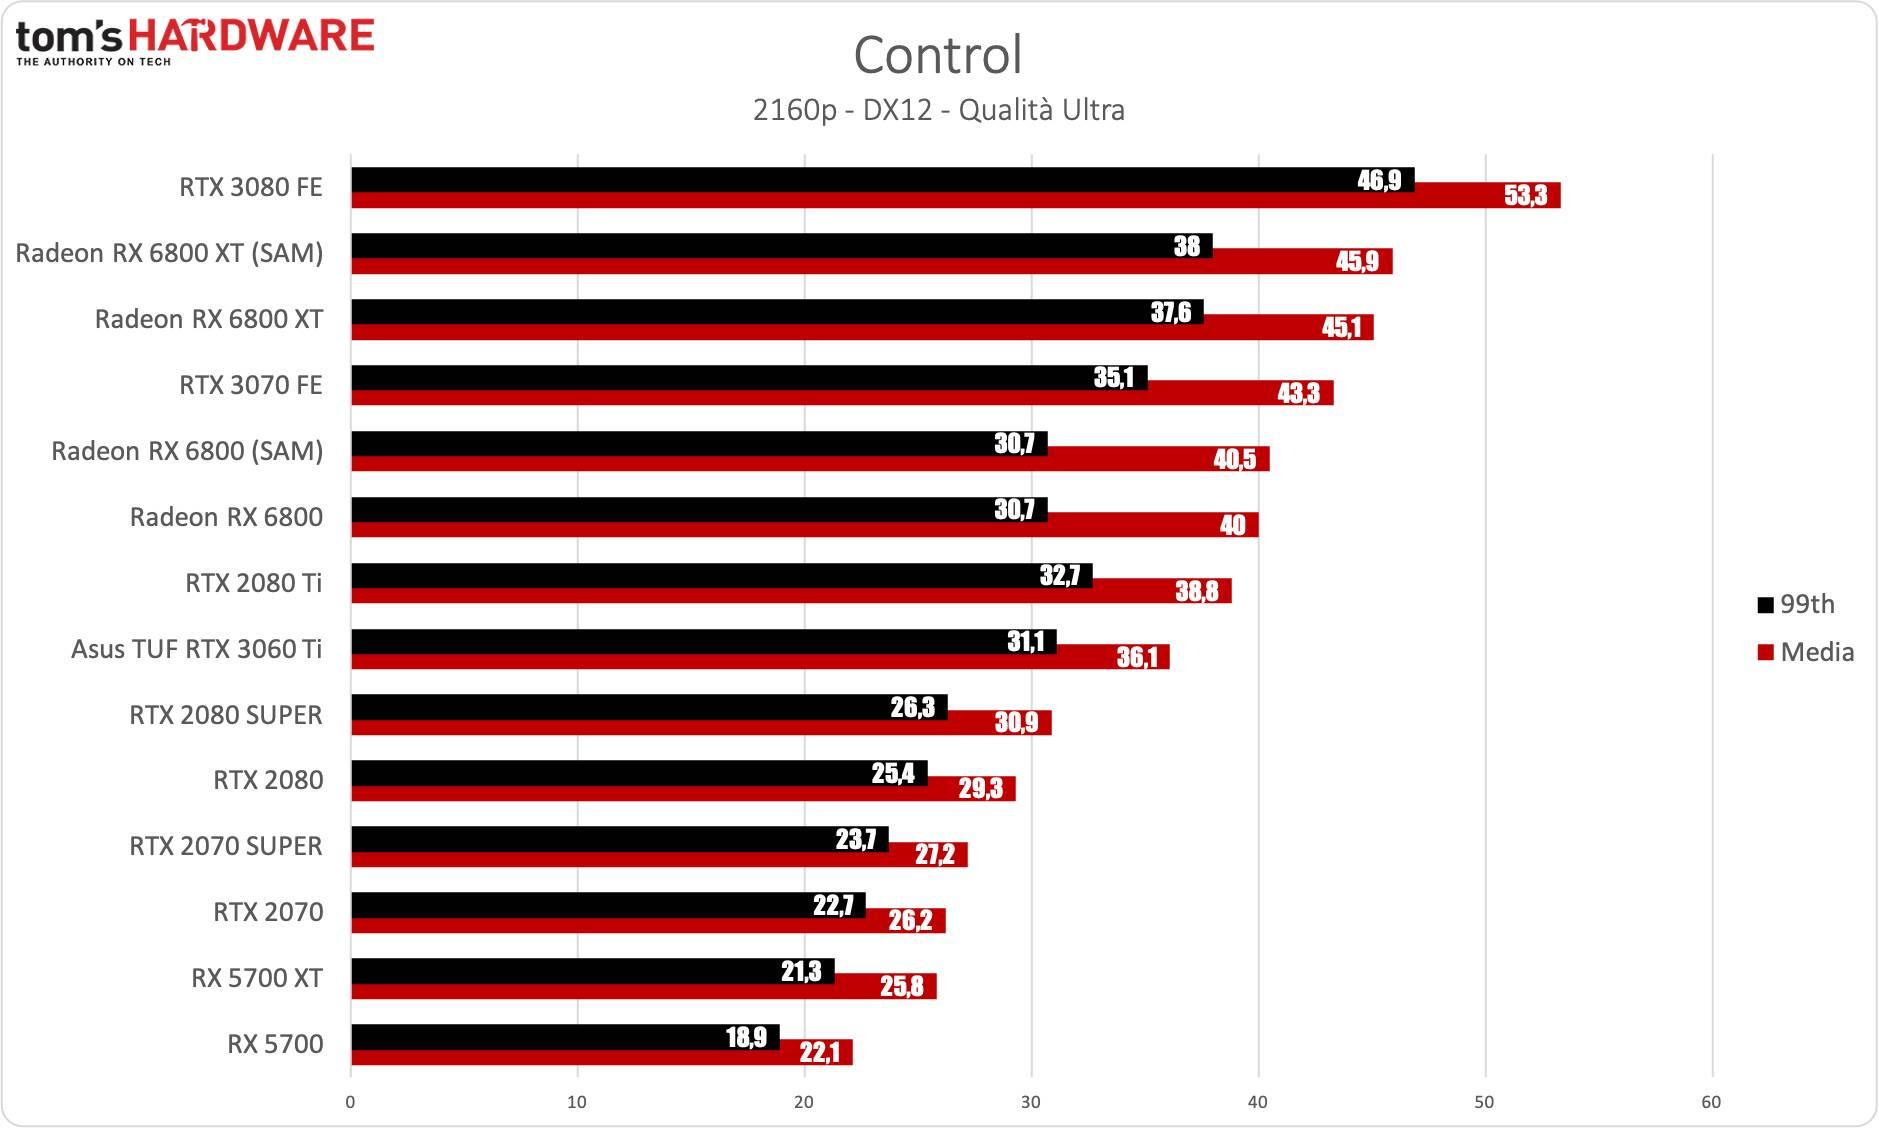 Benchmark Asus RTX 3060 Ti TUF Gaming - 4K - Control